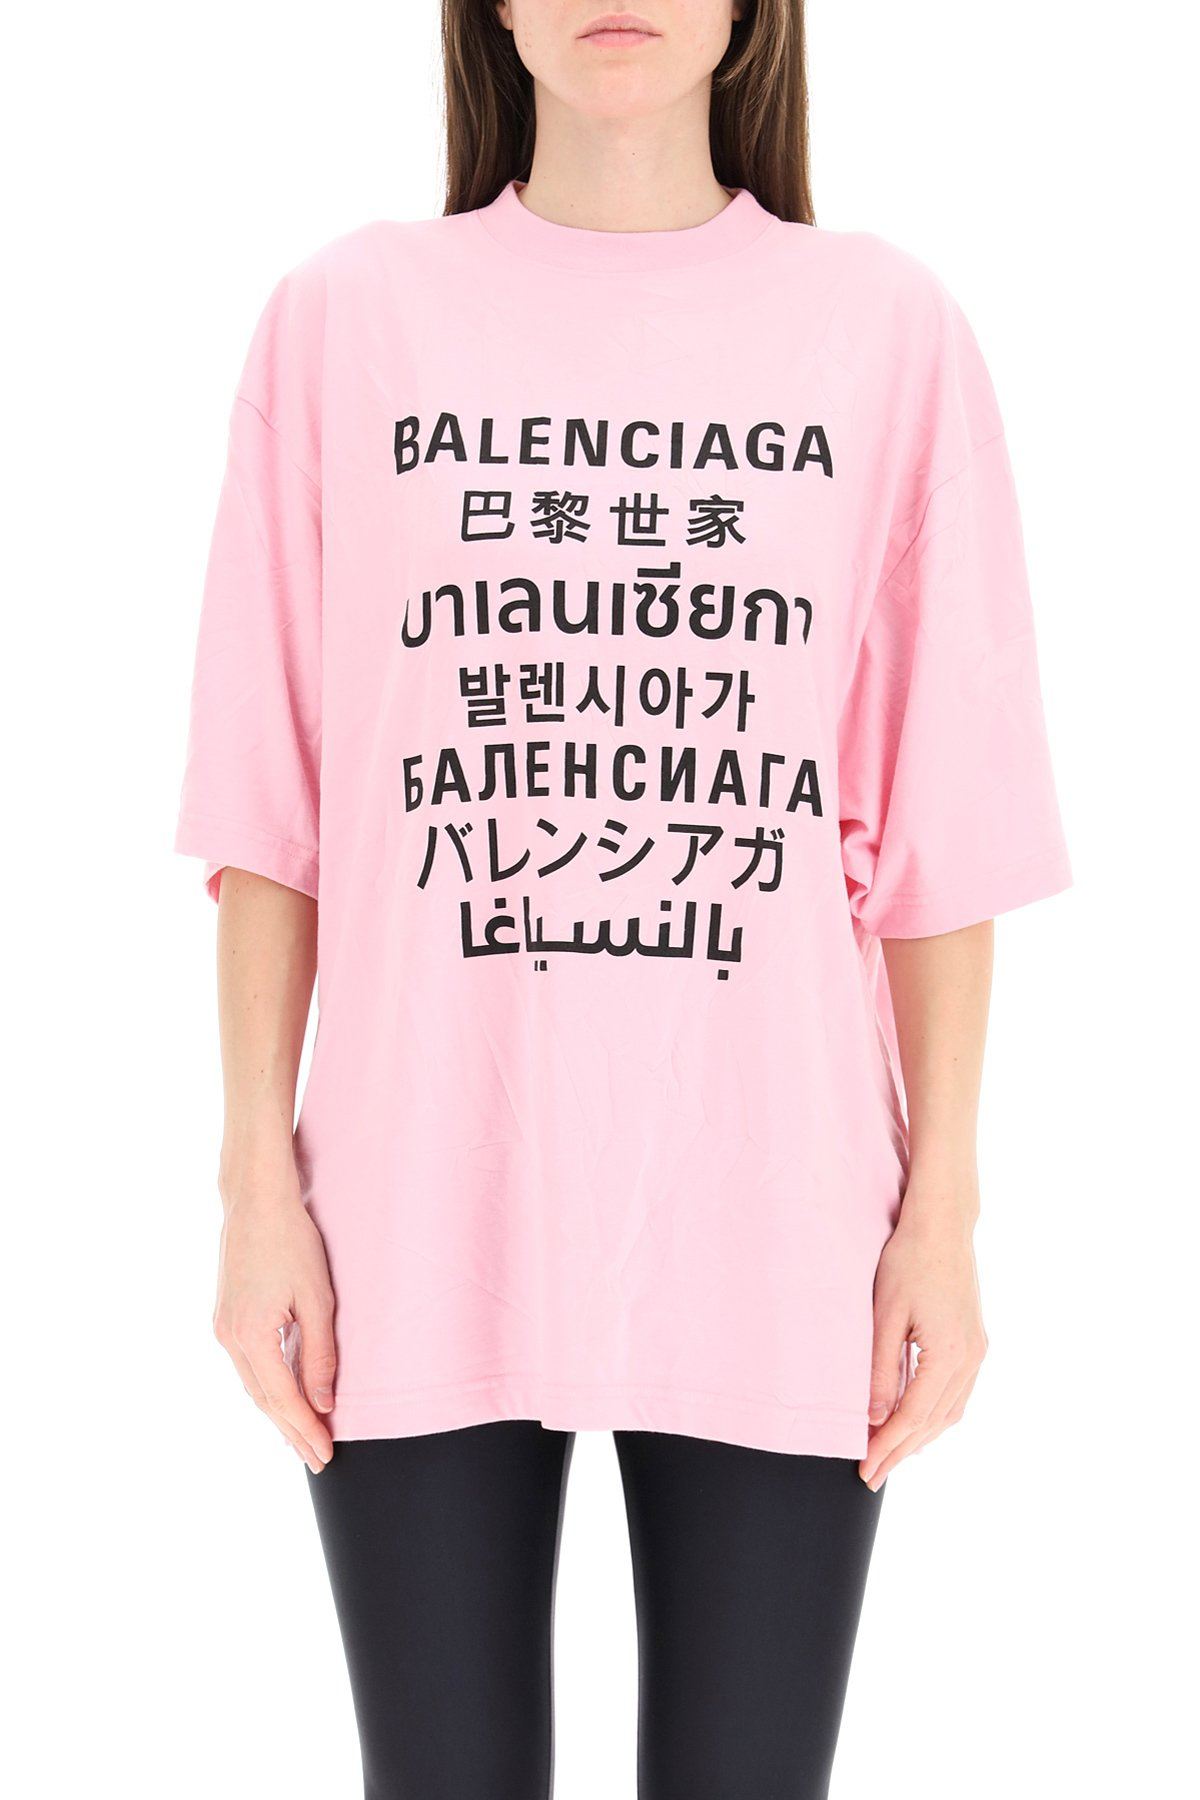 Balenciaga t-shirt over languages